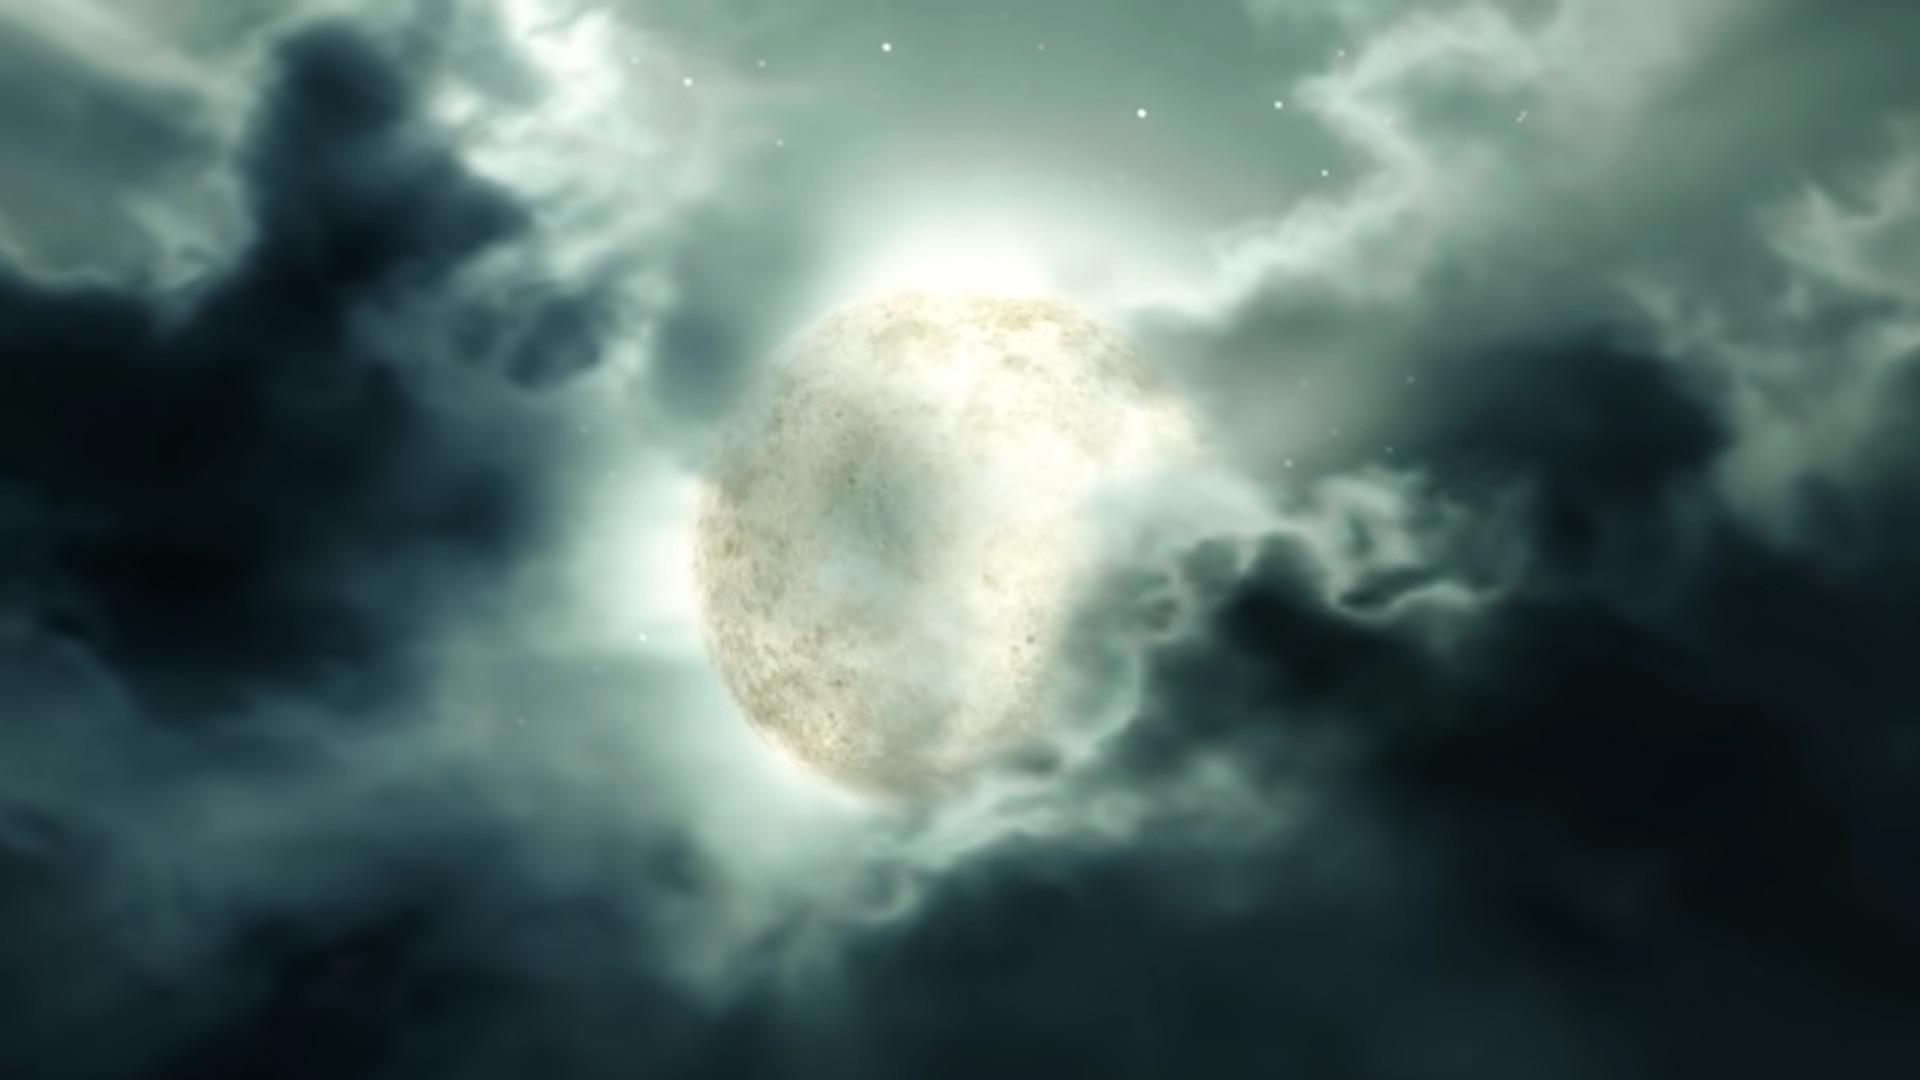 FFXIV patch 5.55 bringing Nier: Automata crossover epilogue, Endwalker prelude